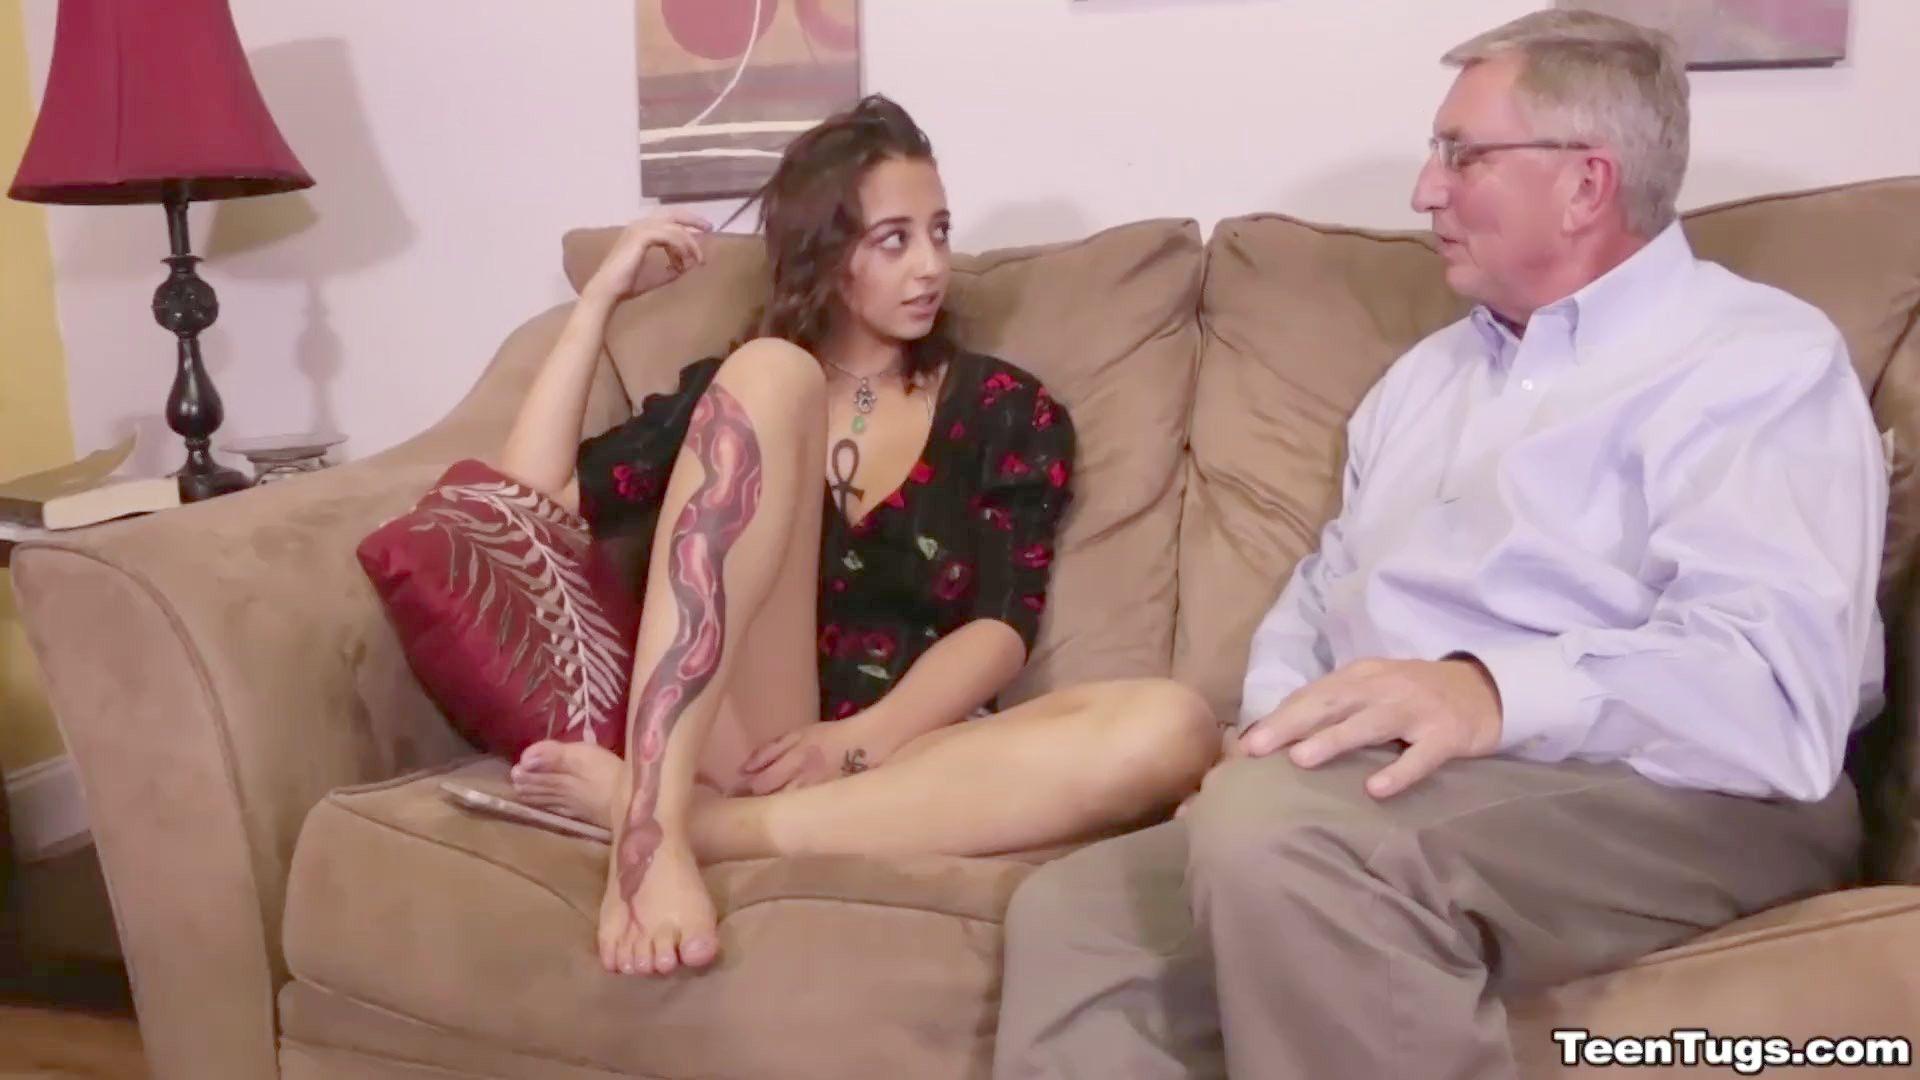 Menantu Dan Mertua Selingkuh Porn Video